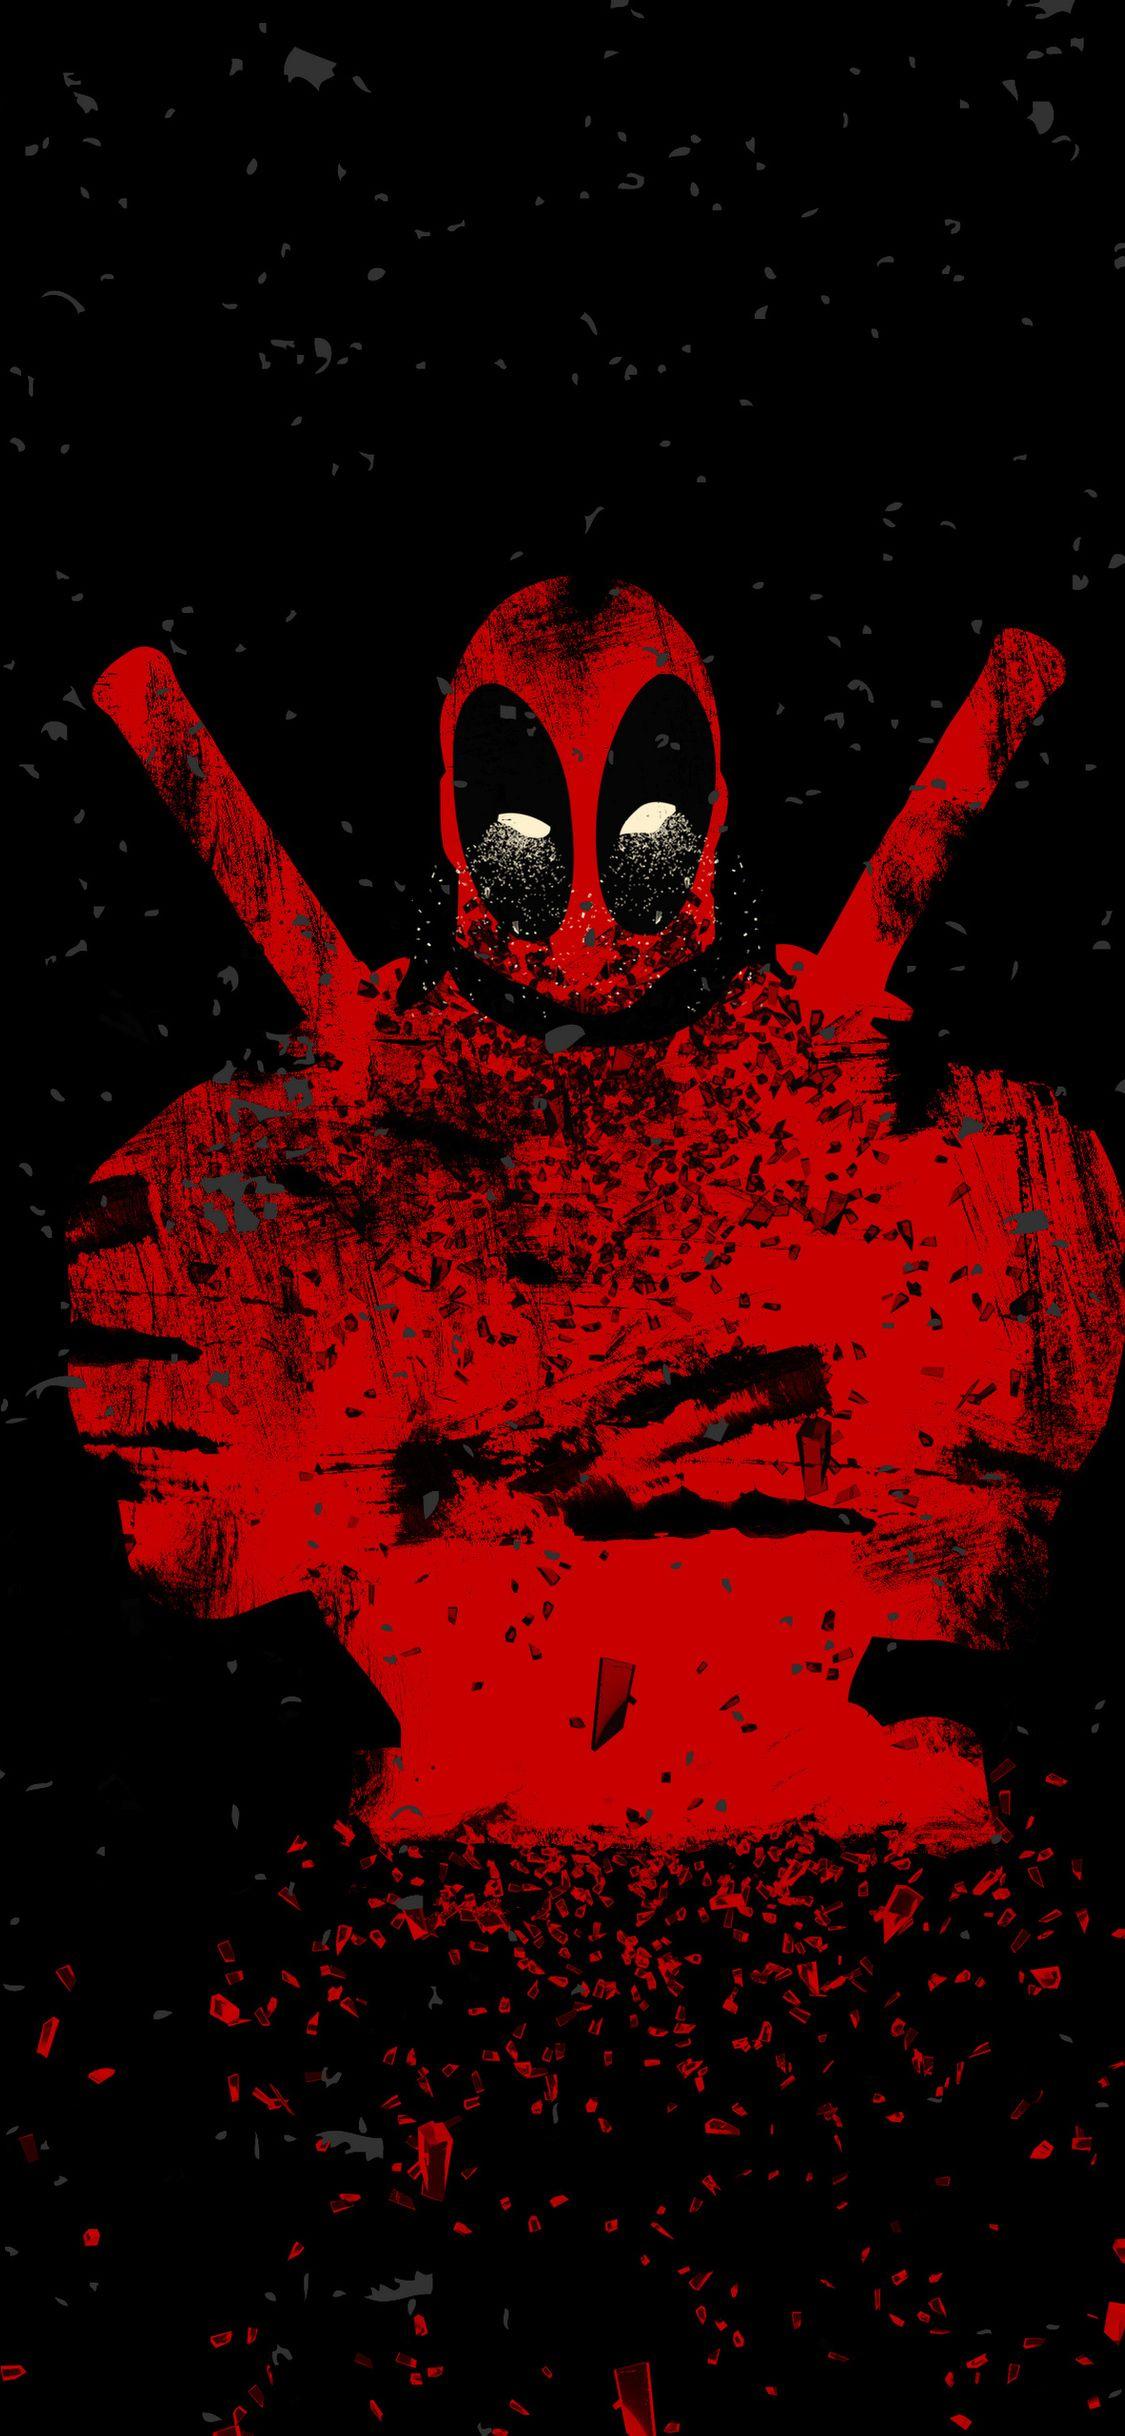 Deadpool Wallpaper 4k Iphone 3D Wallpapers Deadpool